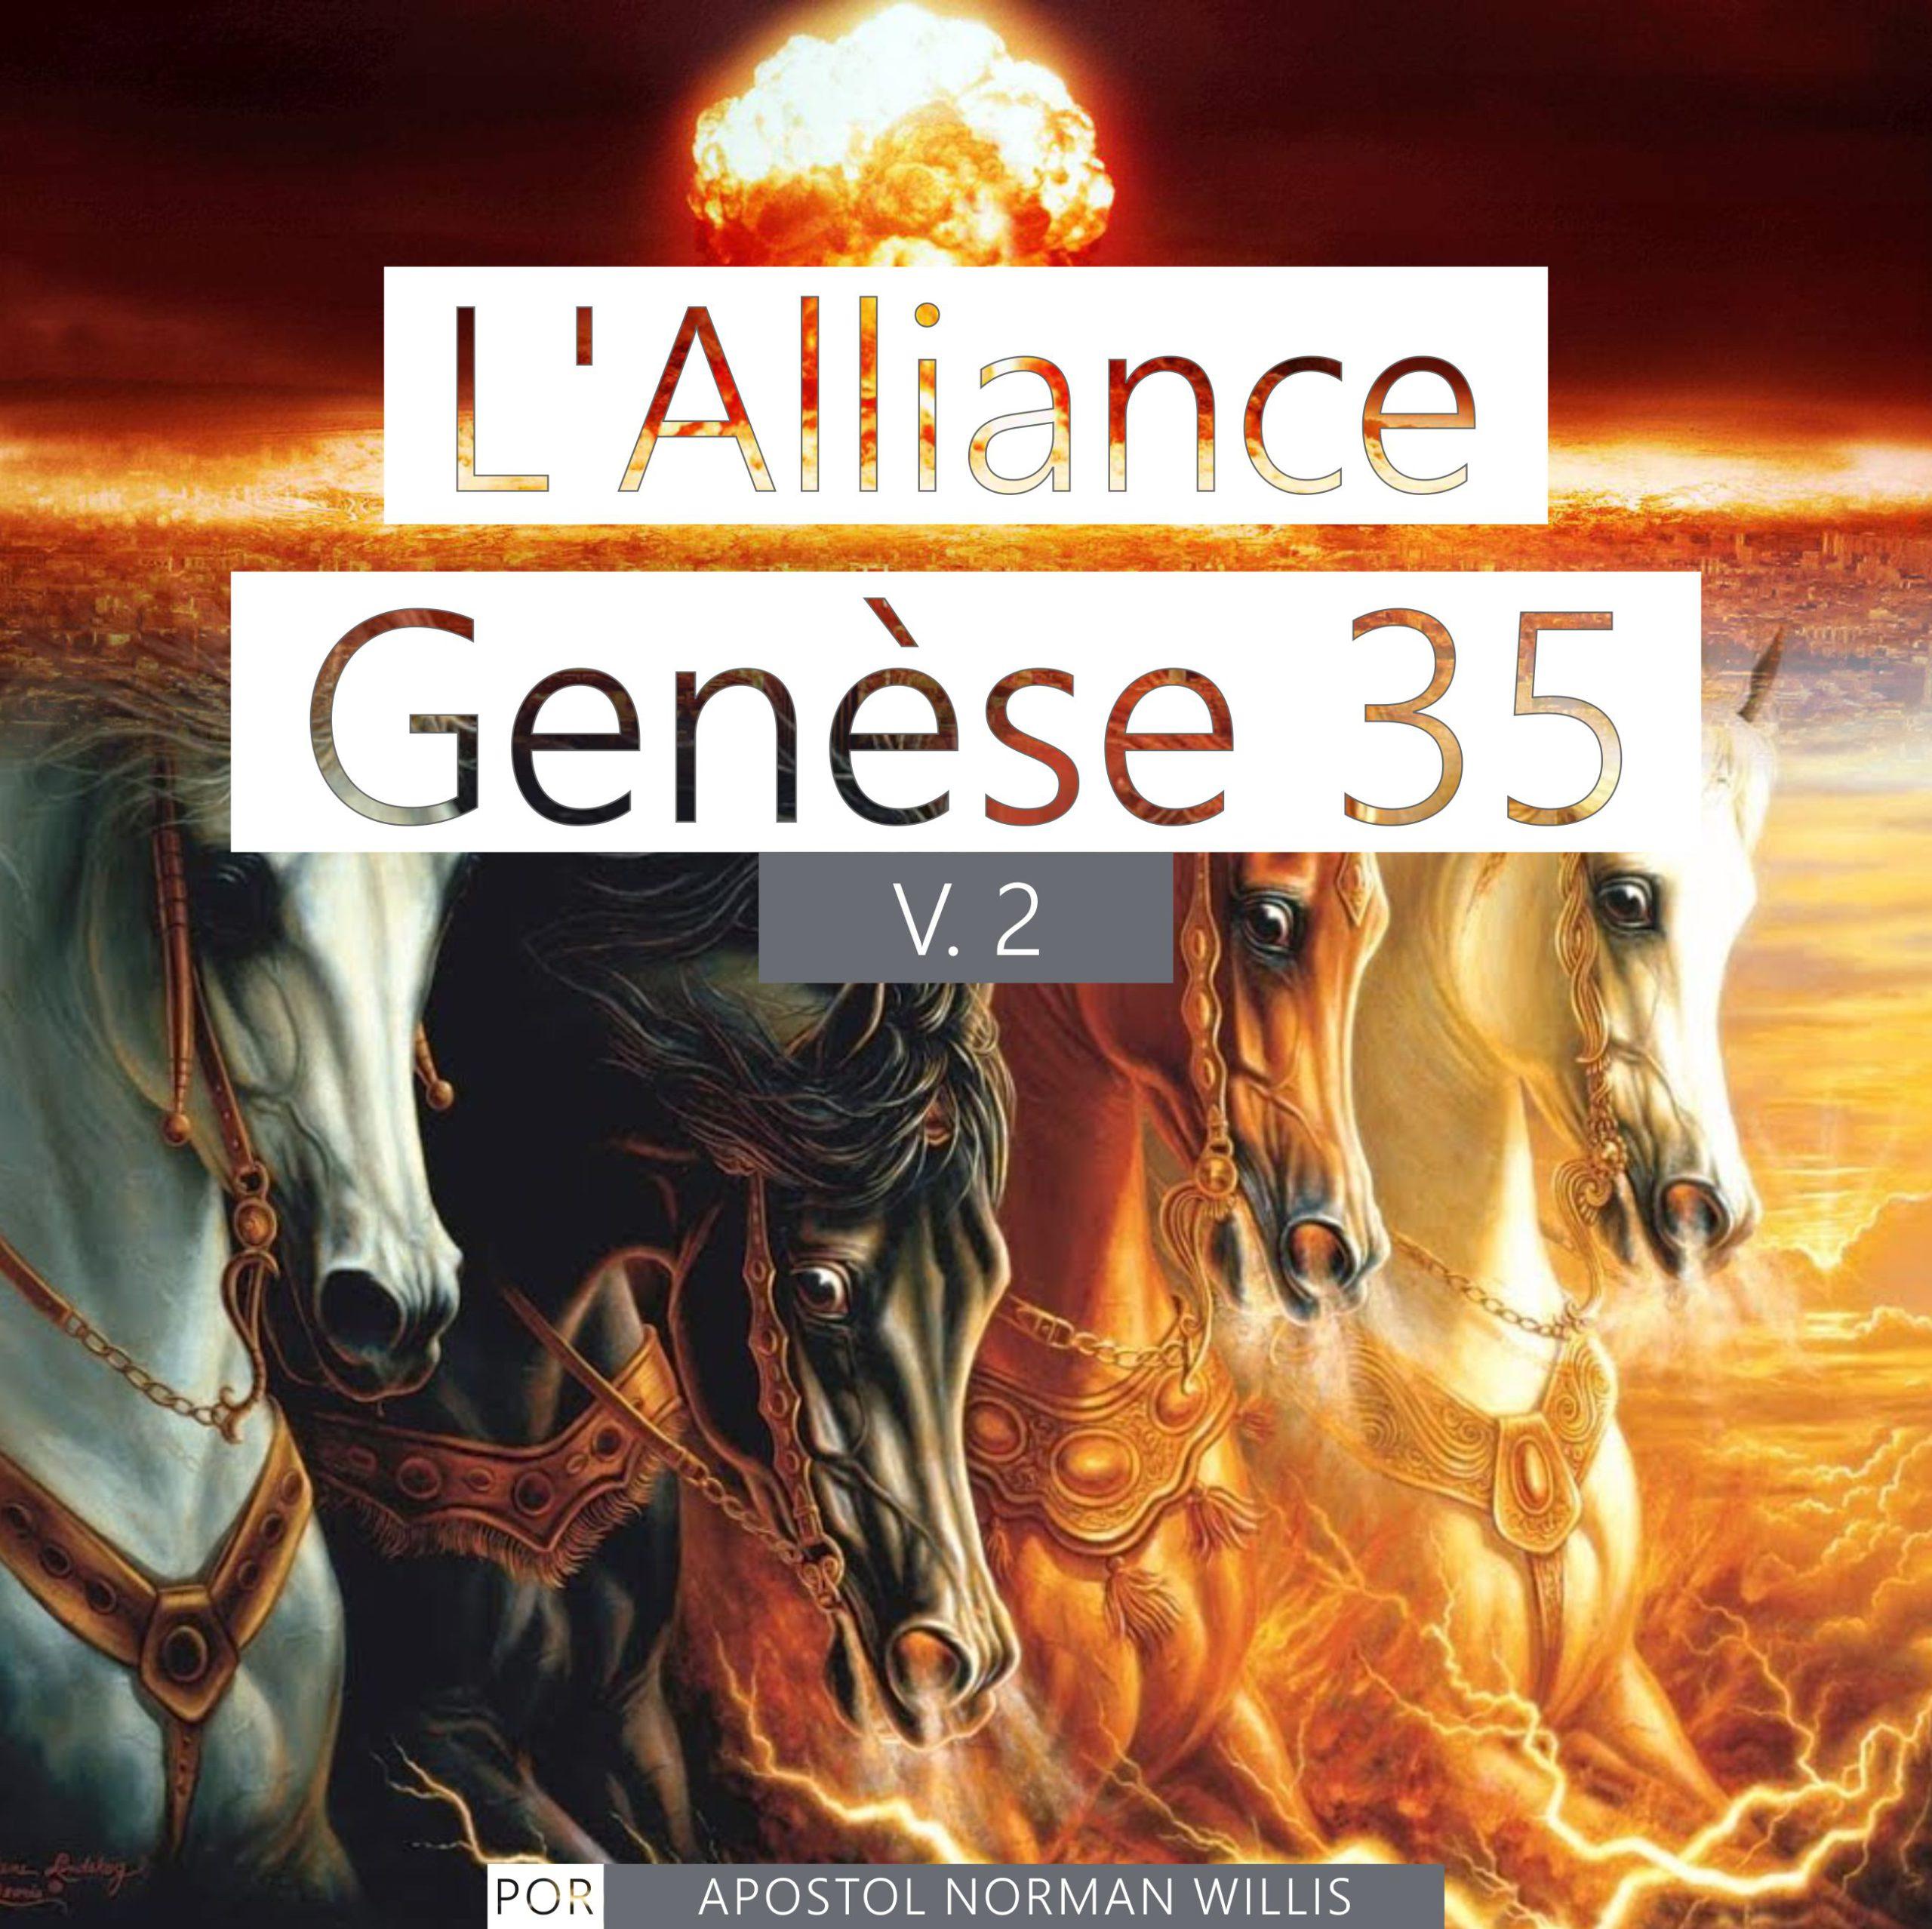 L'Alliance Genesis 35 v2